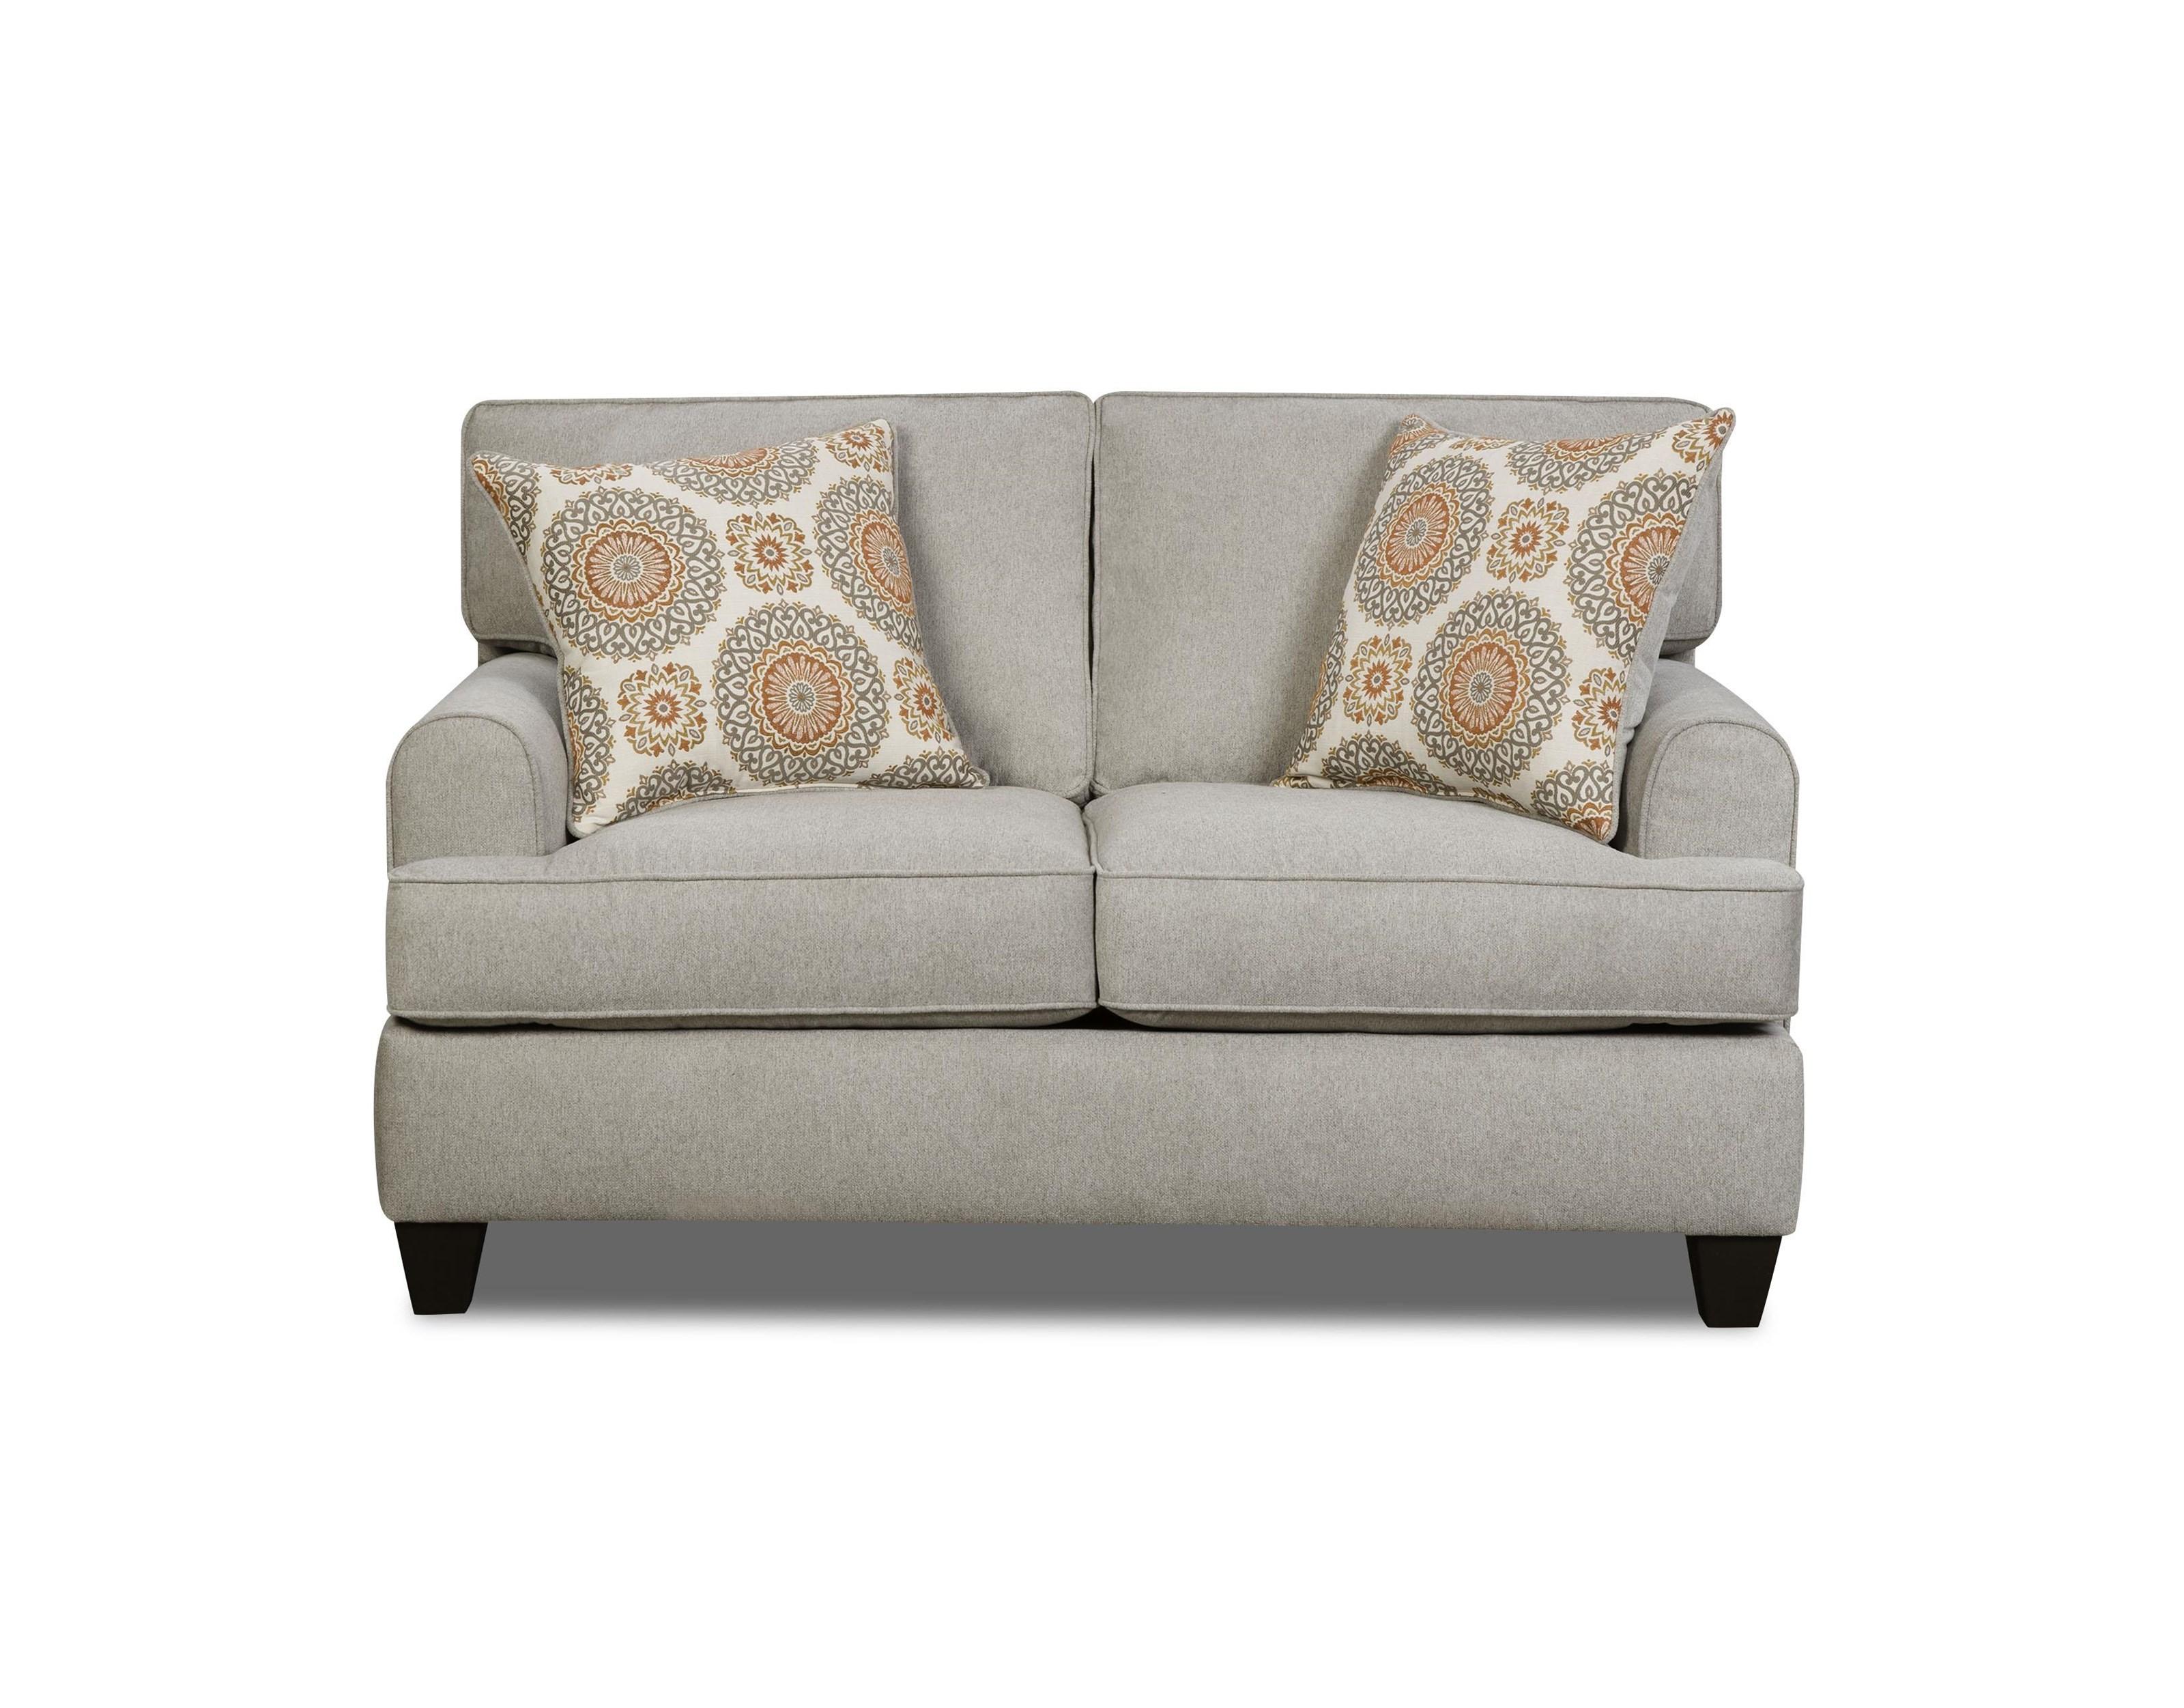 American Furniture 1950Dove Popstitch Loveseat - Item Number: 1952Dove